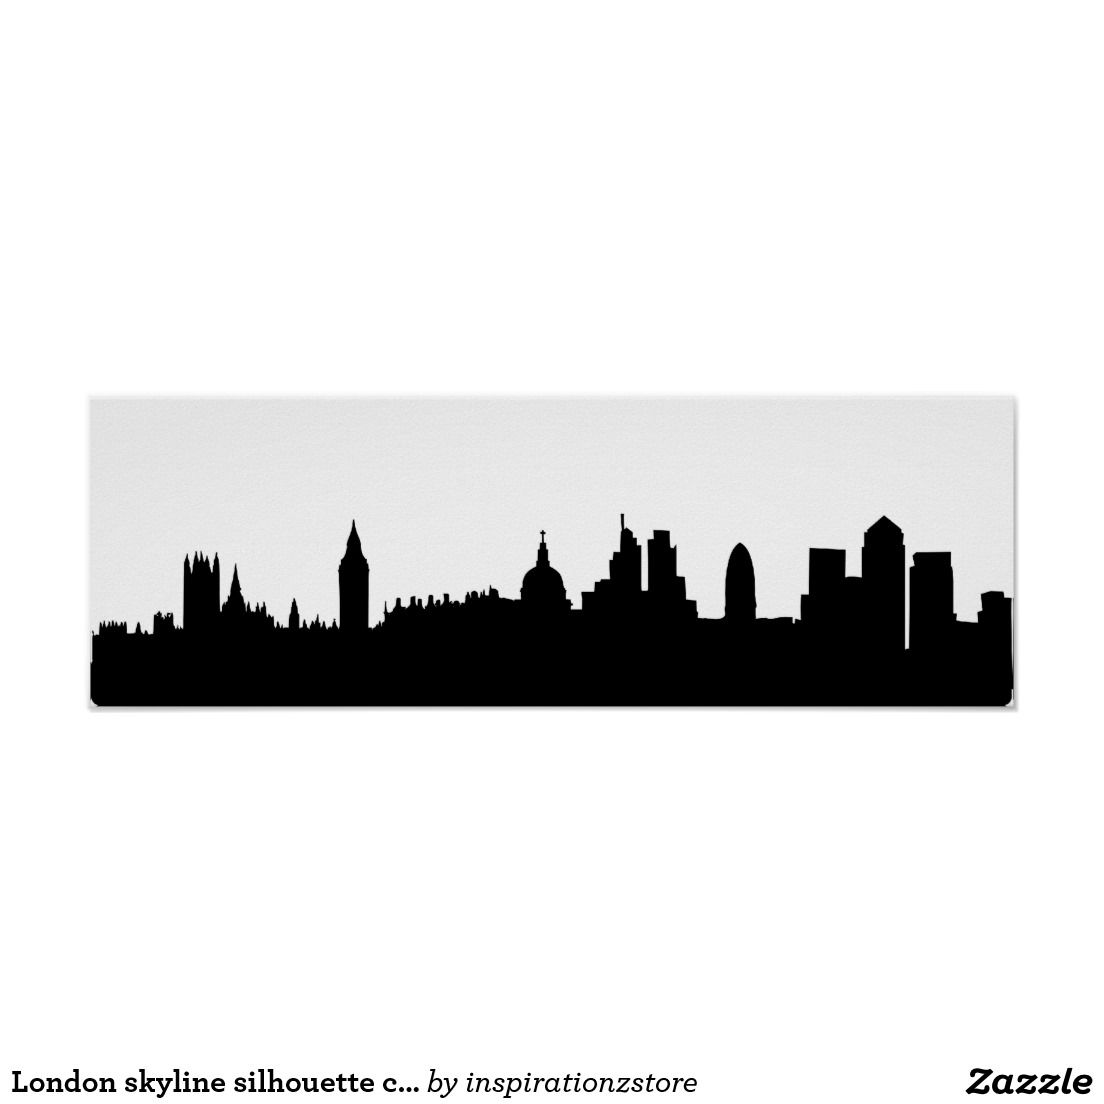 London Skyline Silhouette Cityscape Poster